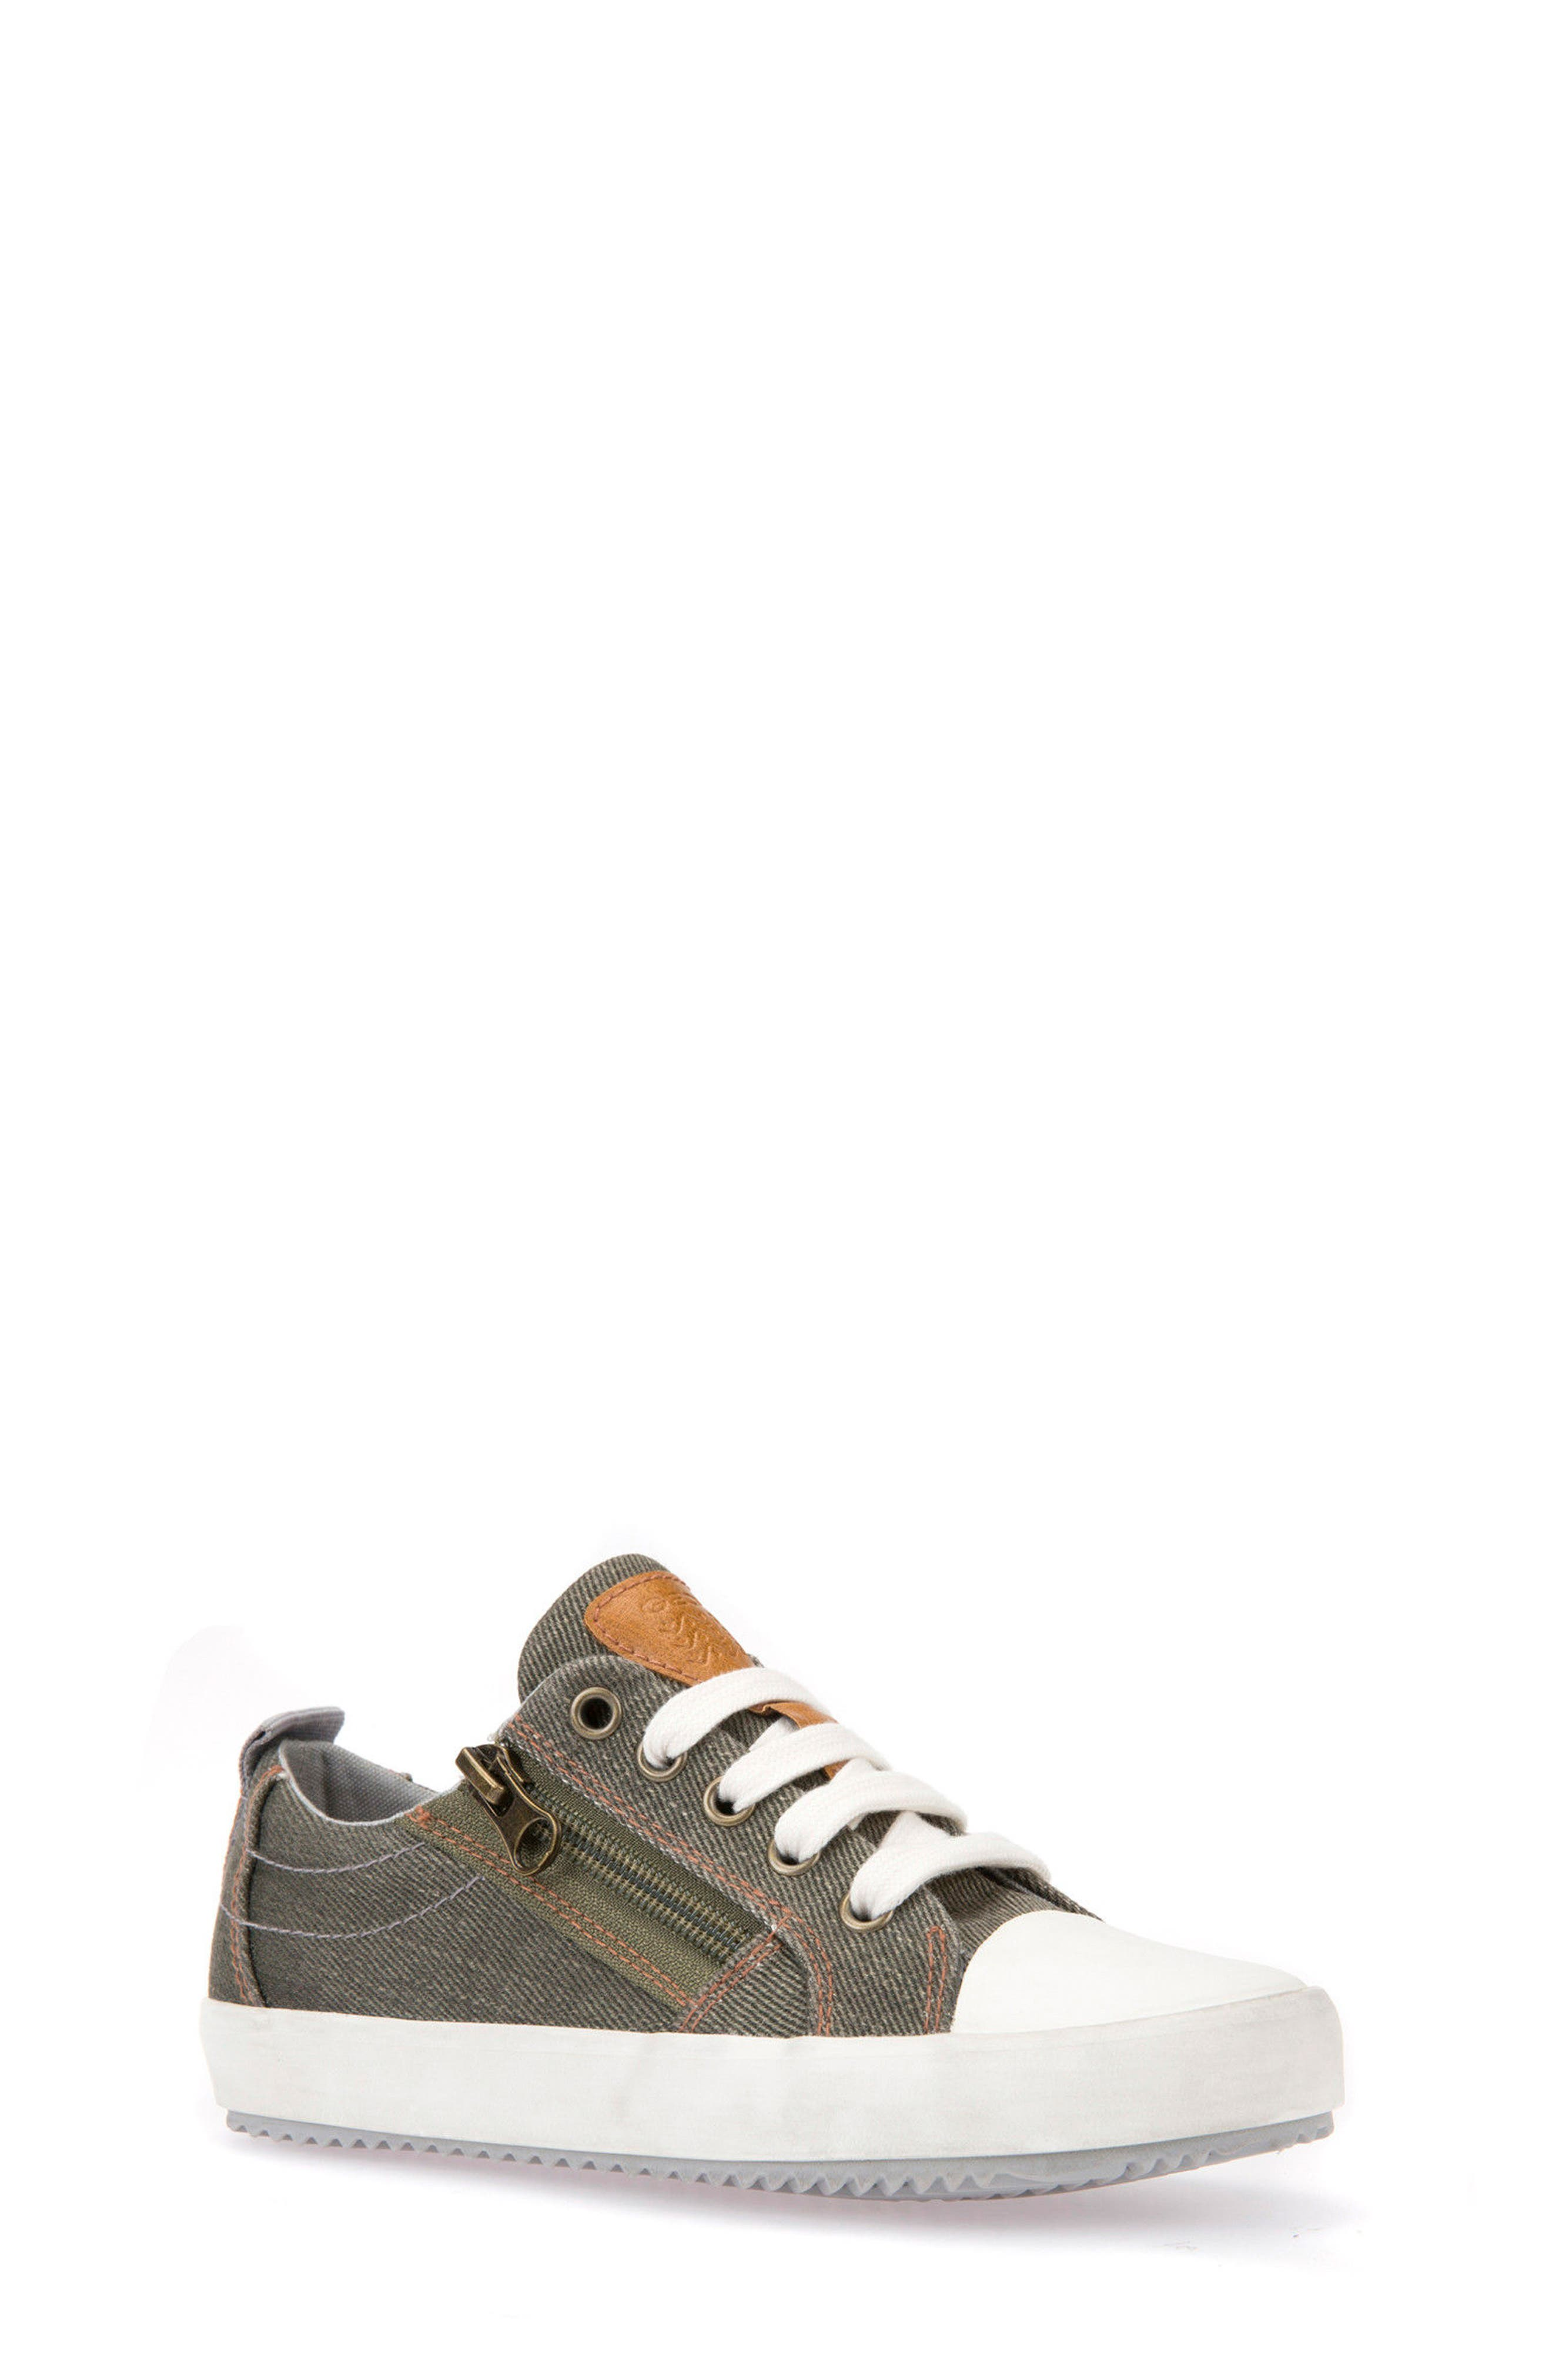 GEOX Alonisso Low Top Sneaker, Main, color, 307